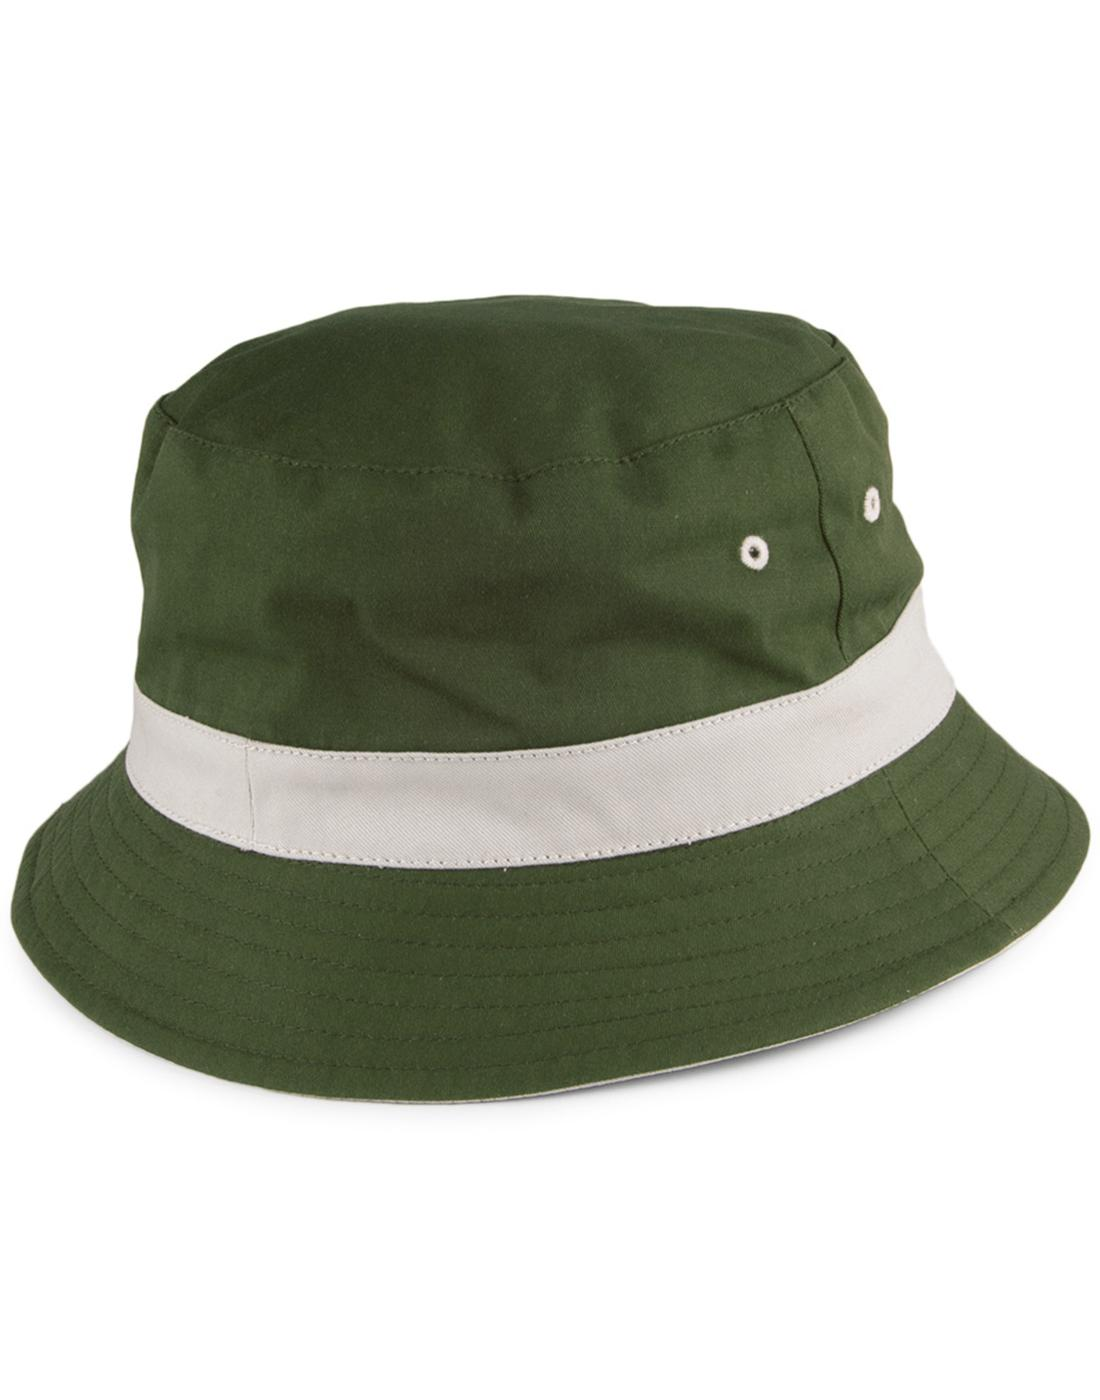 FAILSWORTH Retro Britpop Reversible Bucket Hat